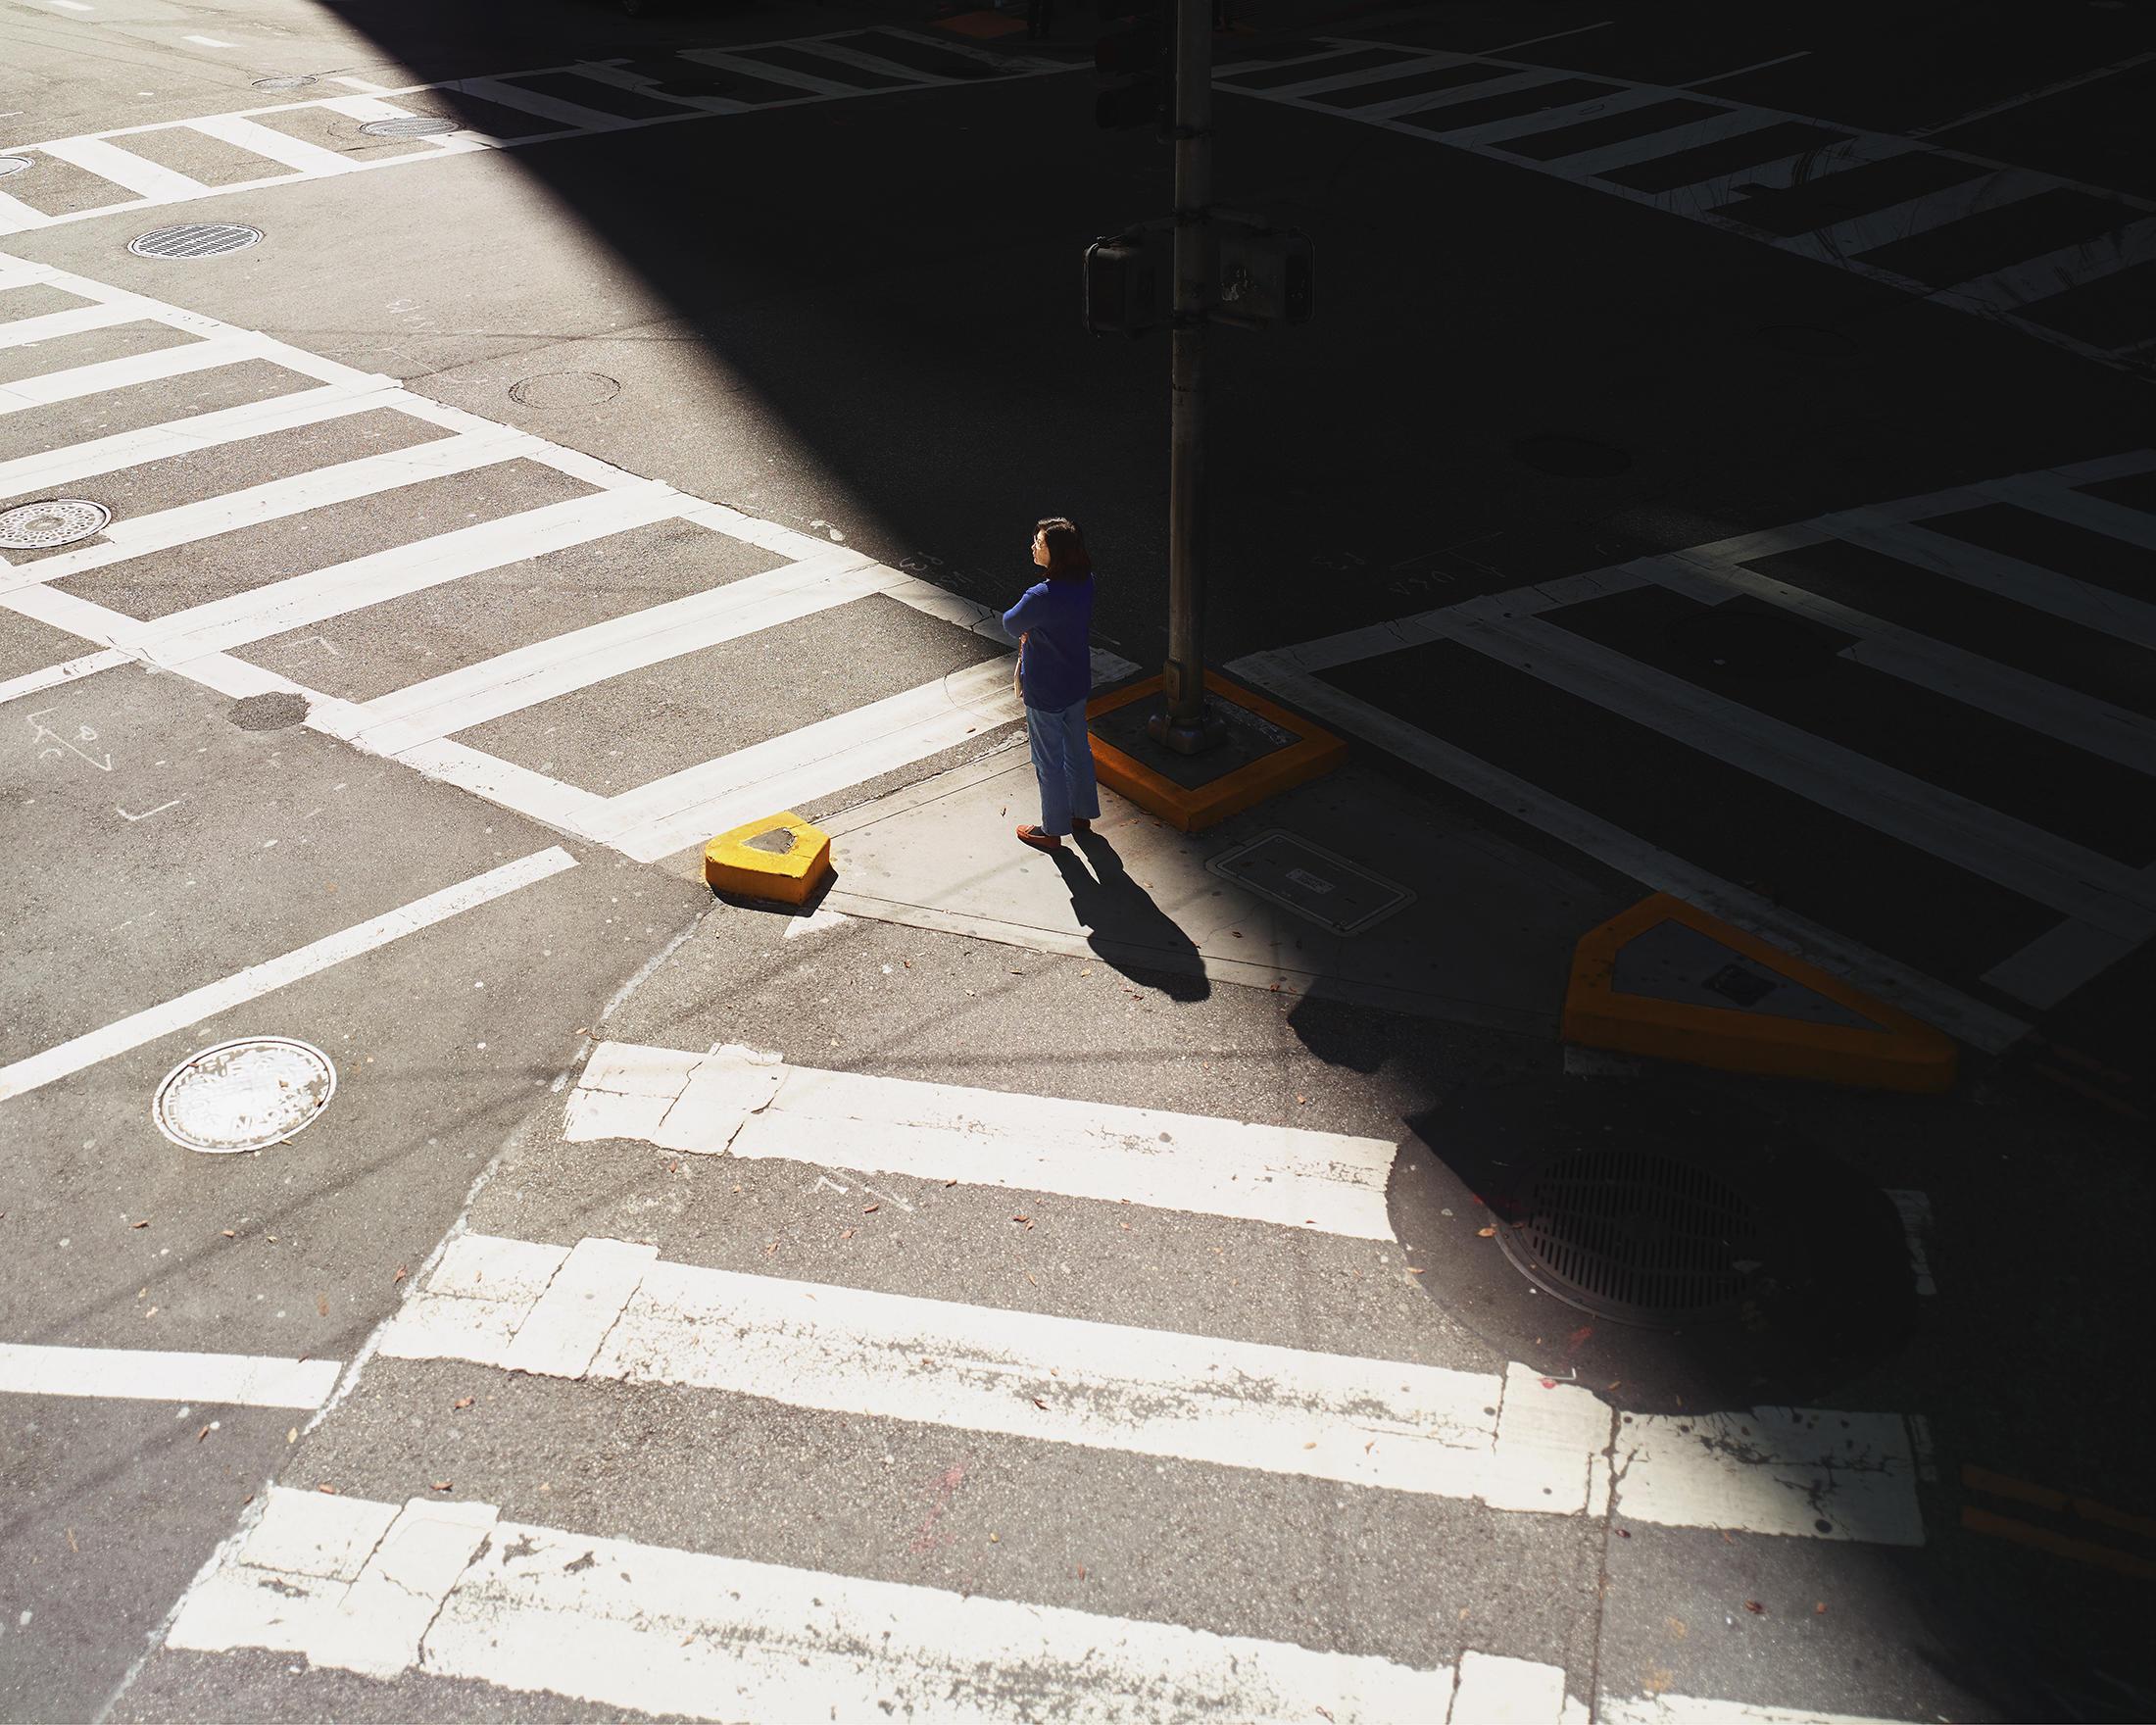 Oli_Kellett_7 - Stockton St, San Francisco.jpg